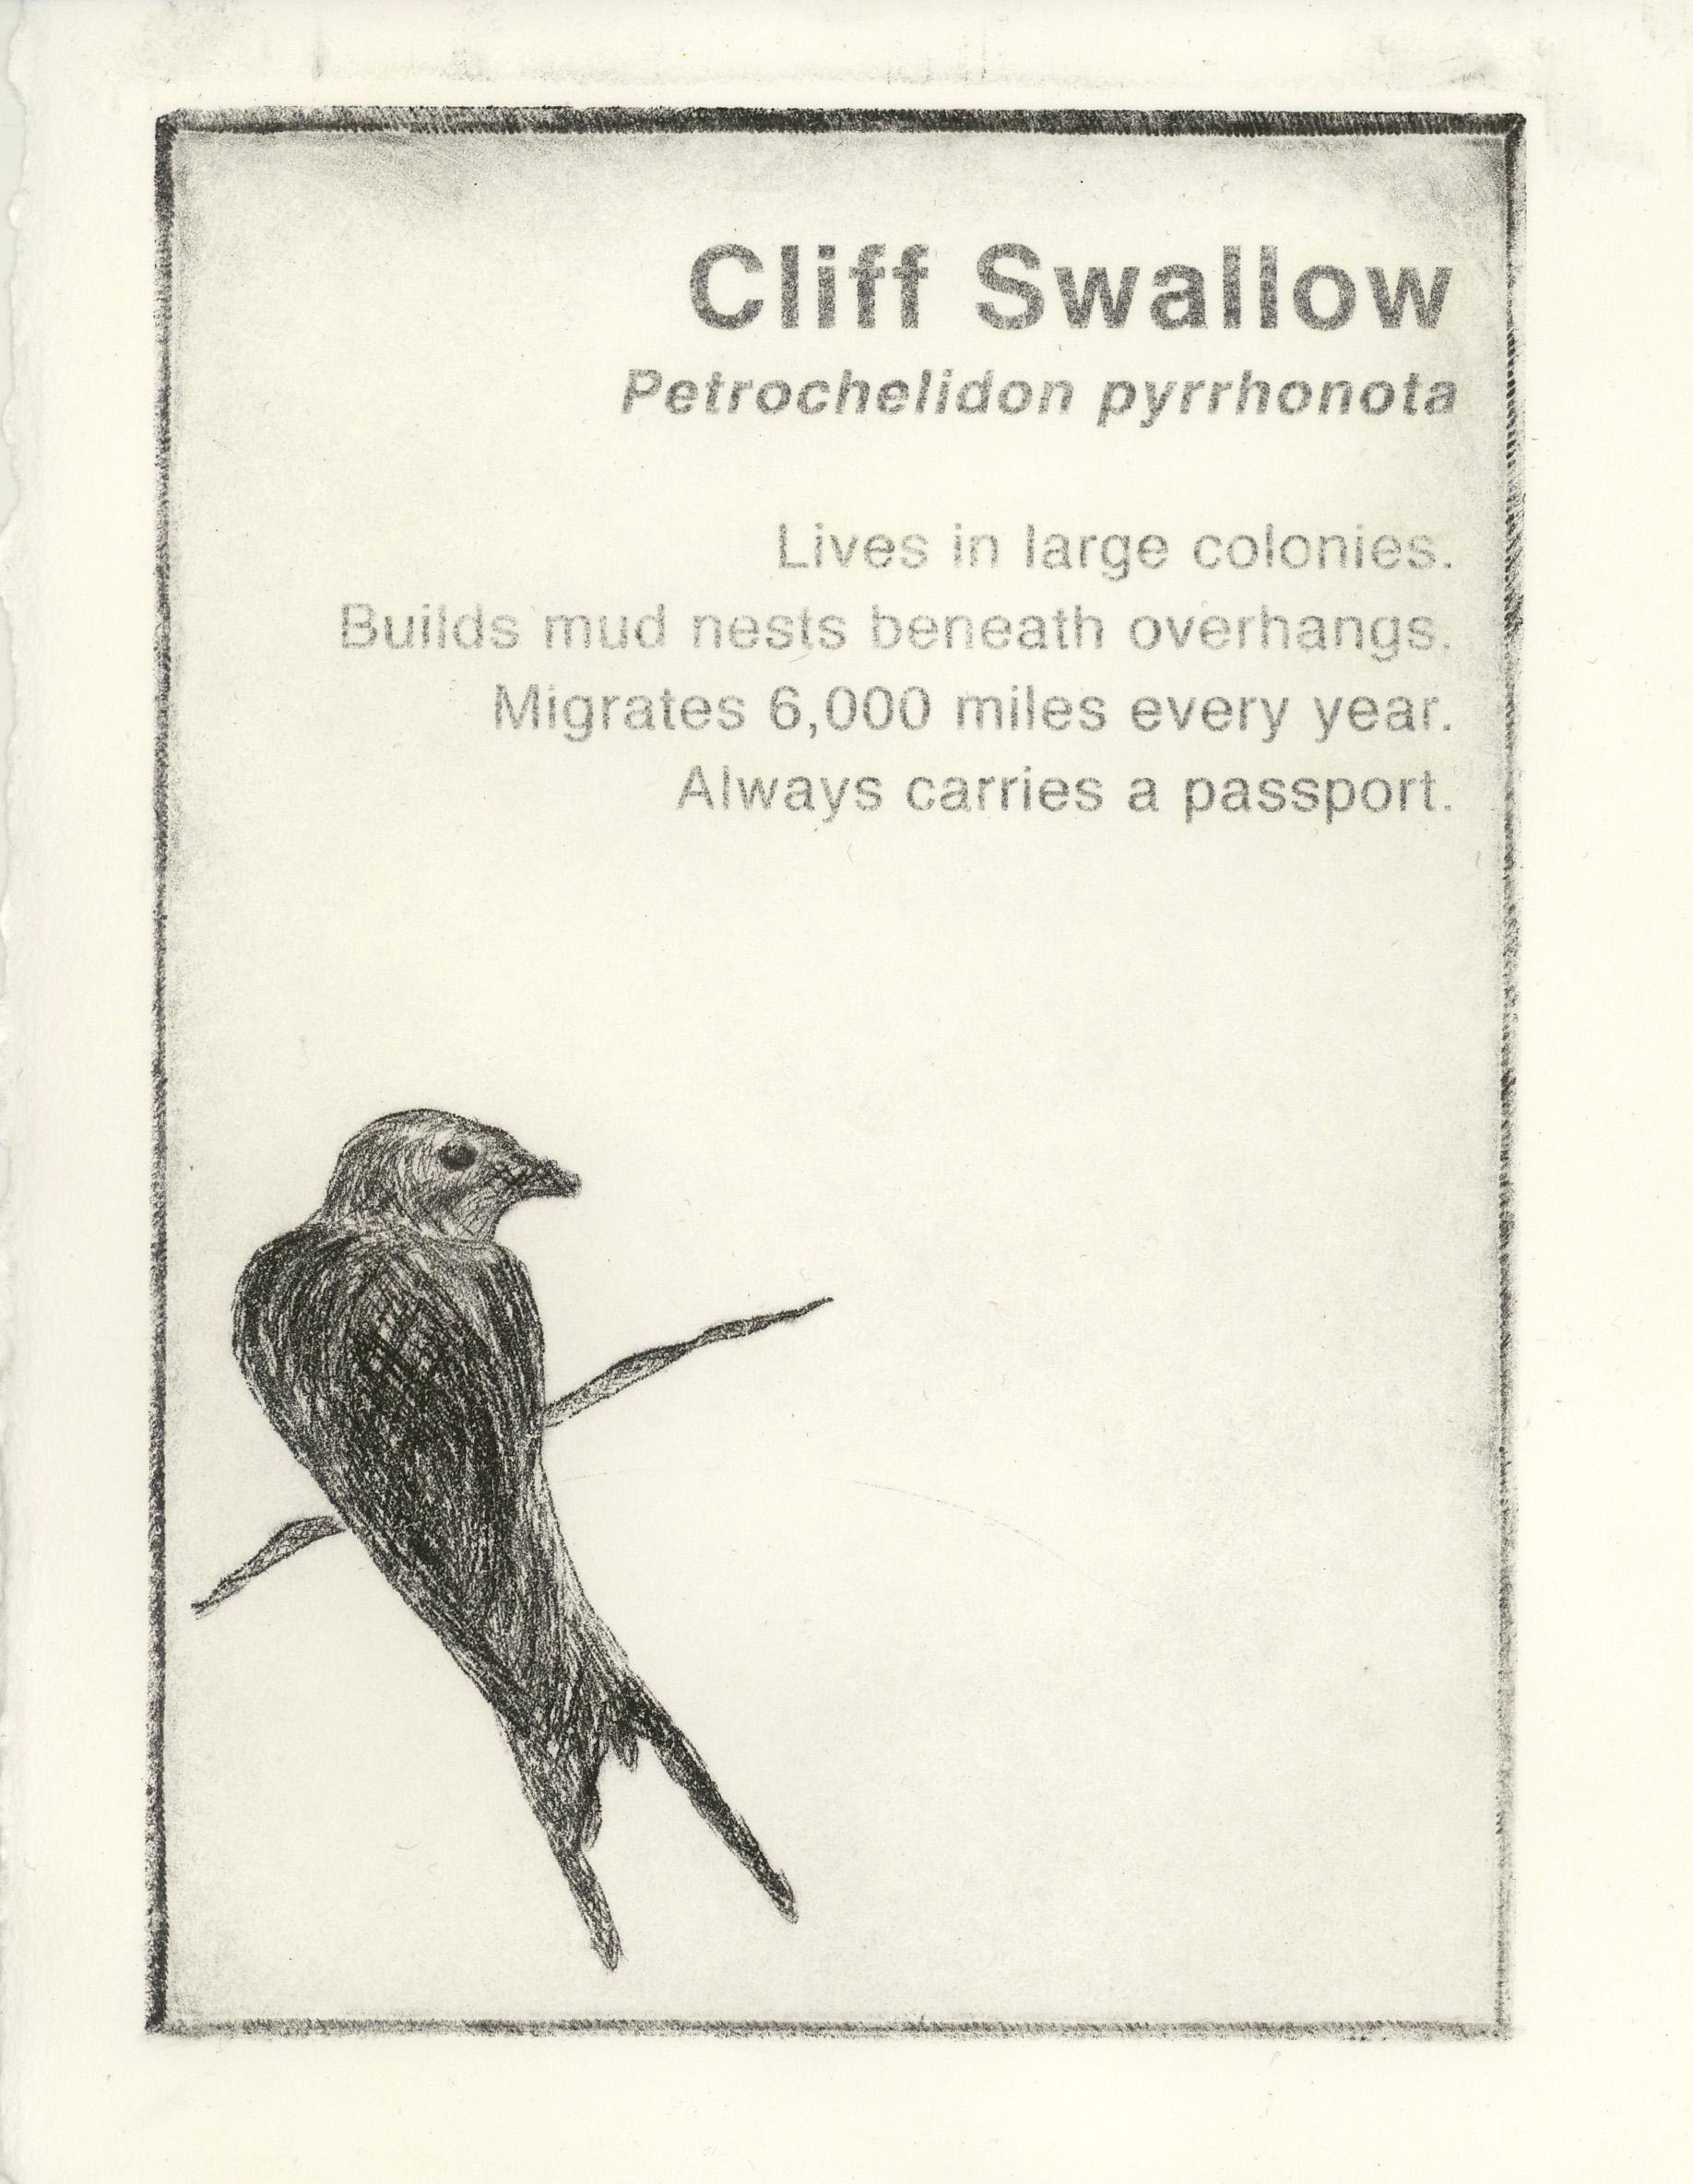 cliff swallow.JPG